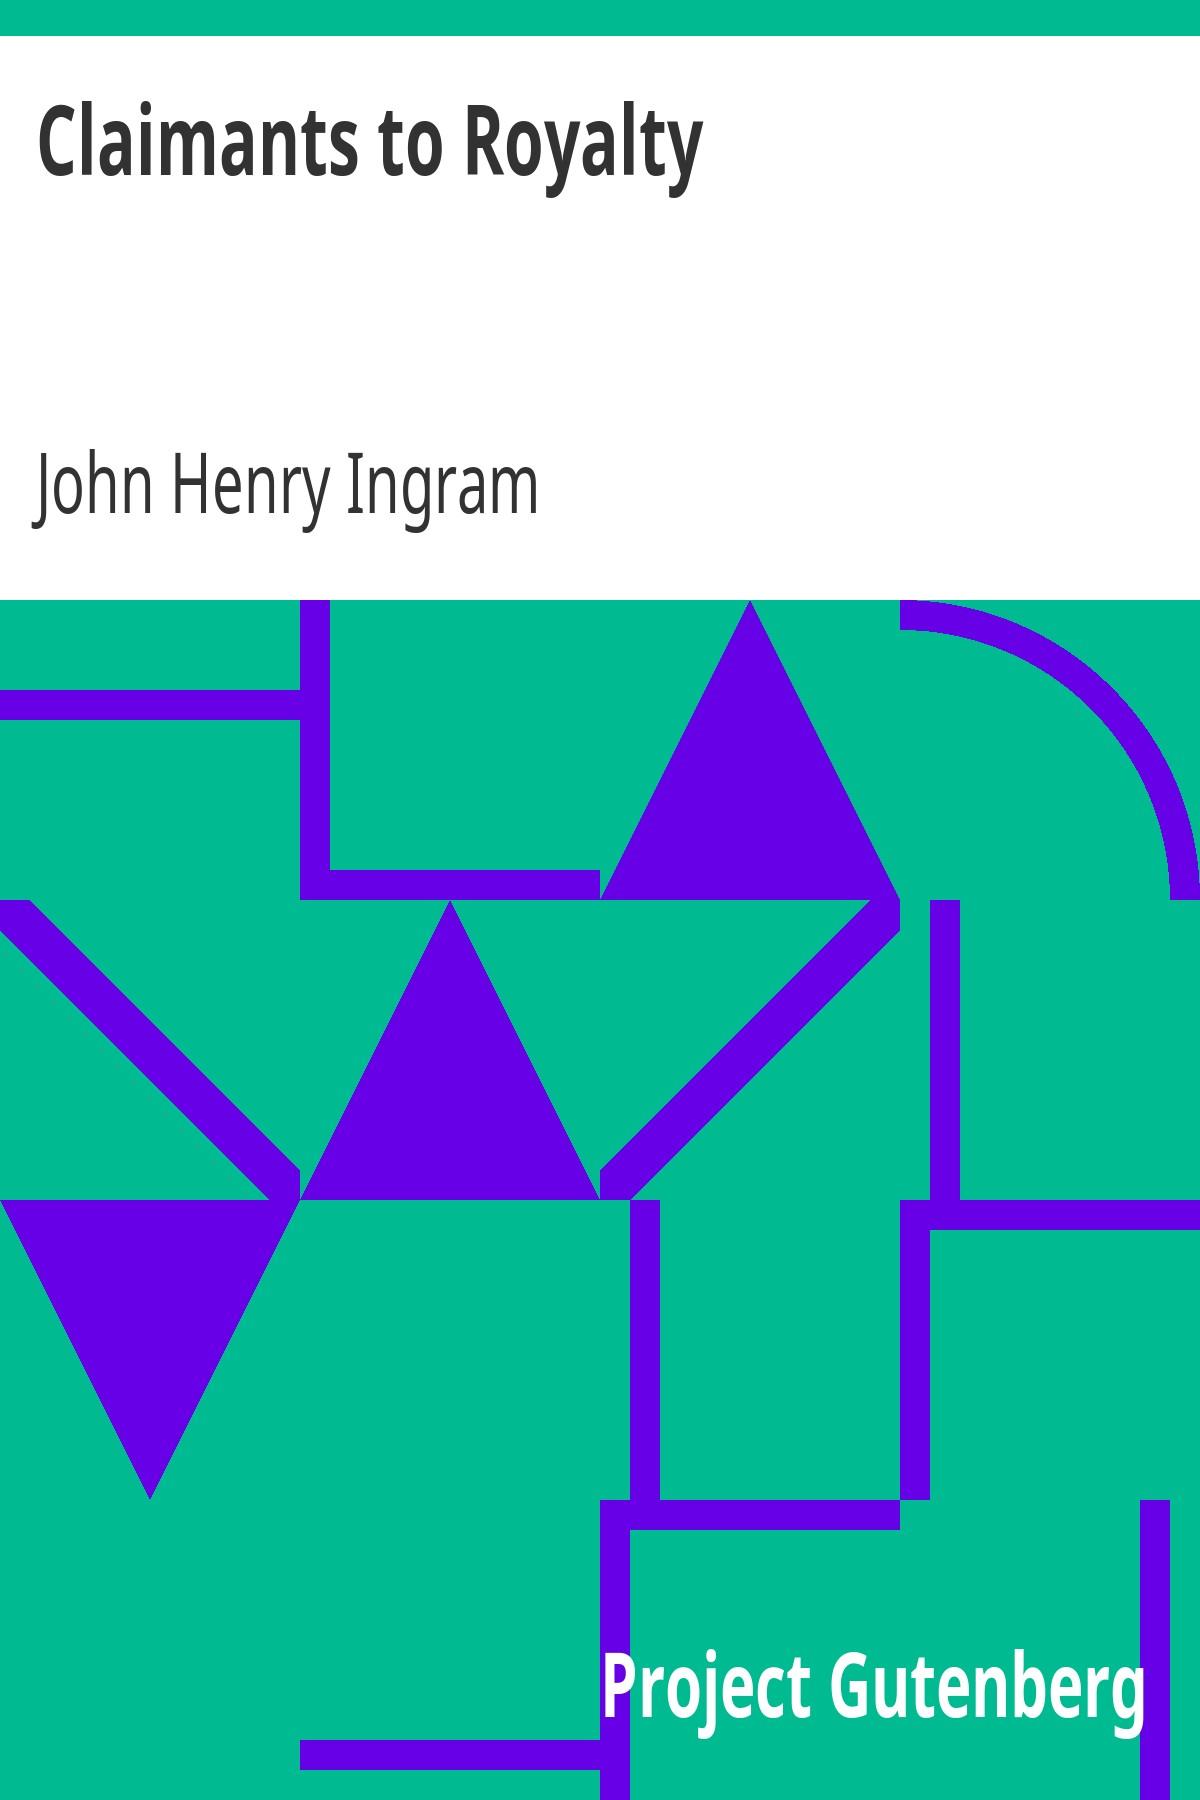 John Henry Ingram Claimants to Royalty